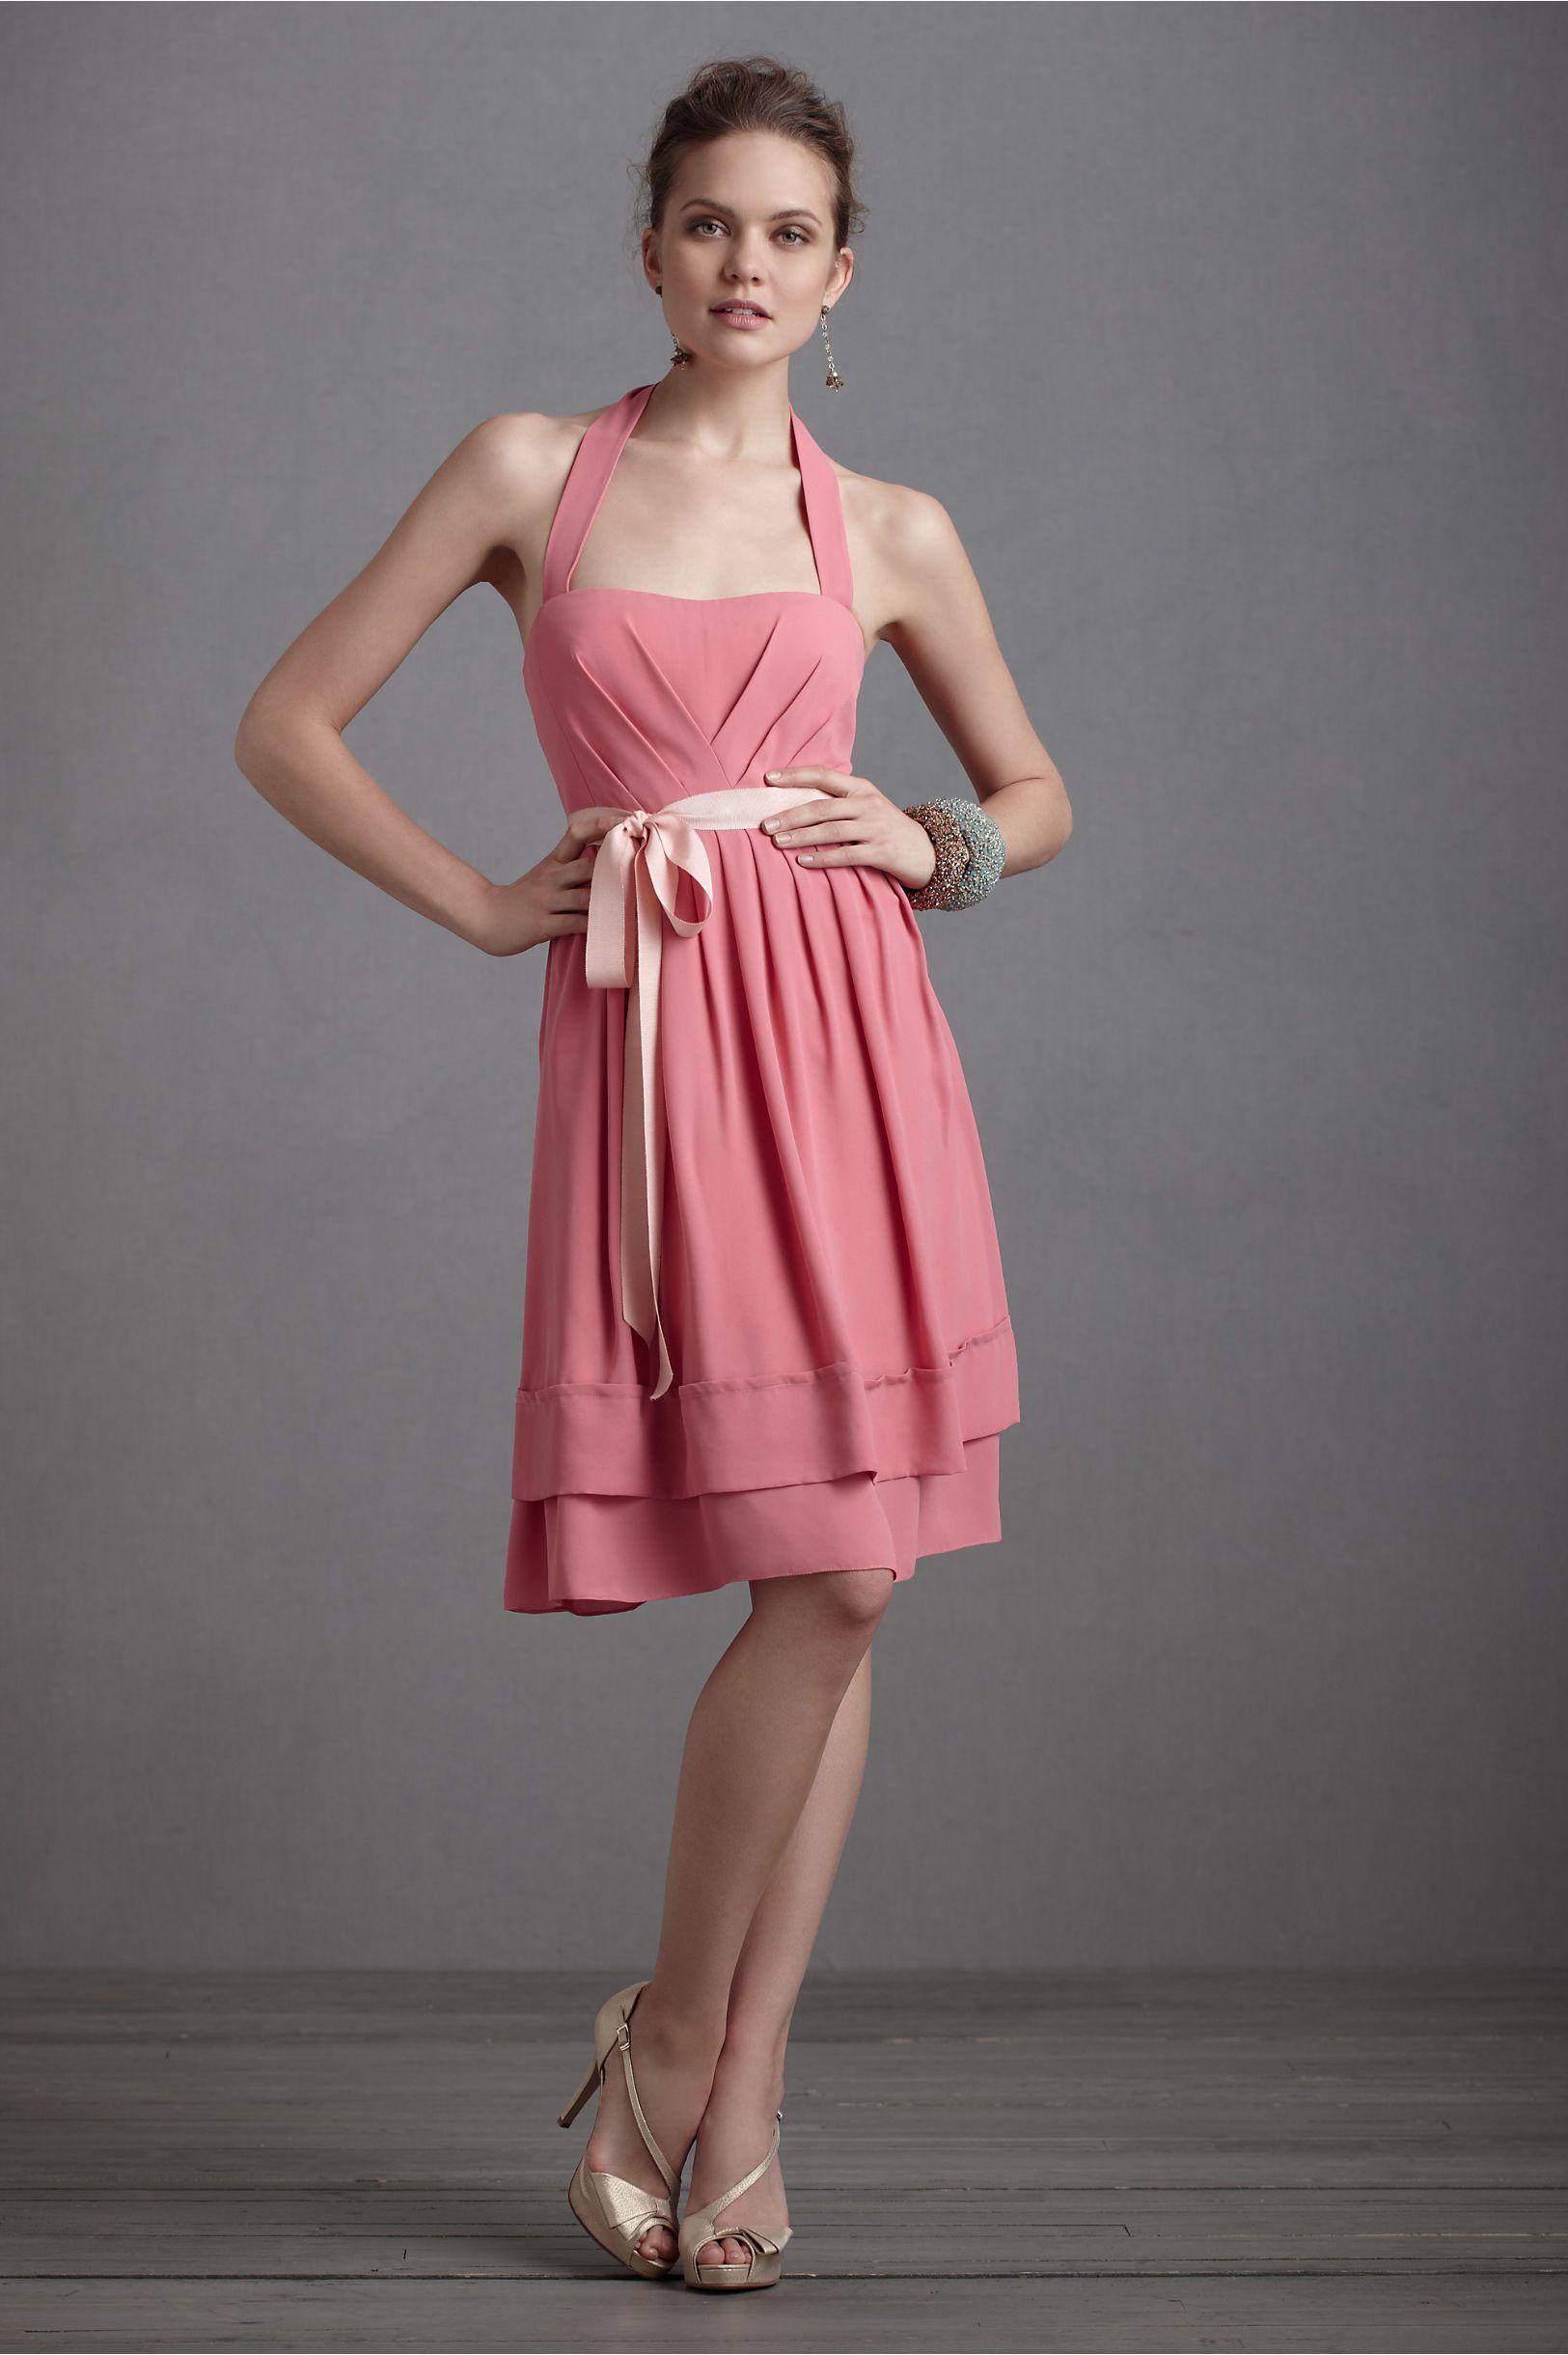 Sunroom dress (BHLDN) - $220 | Bridesmaids\' dresses | Pinterest ...